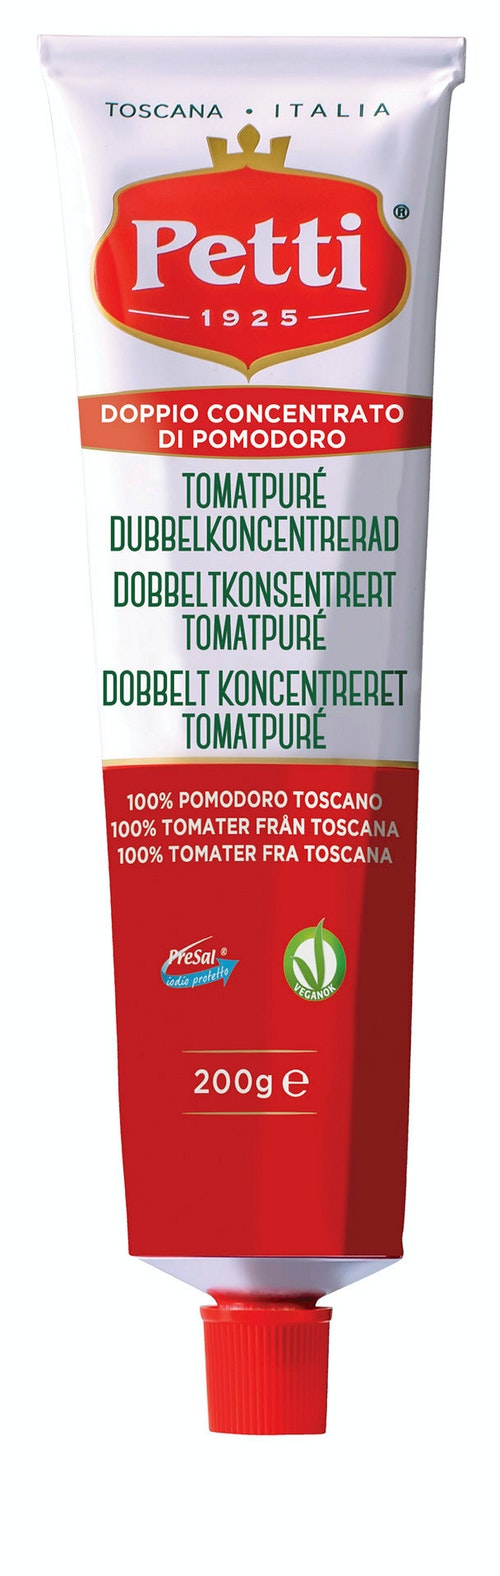 Petti Tomatpure Tube, 200 g